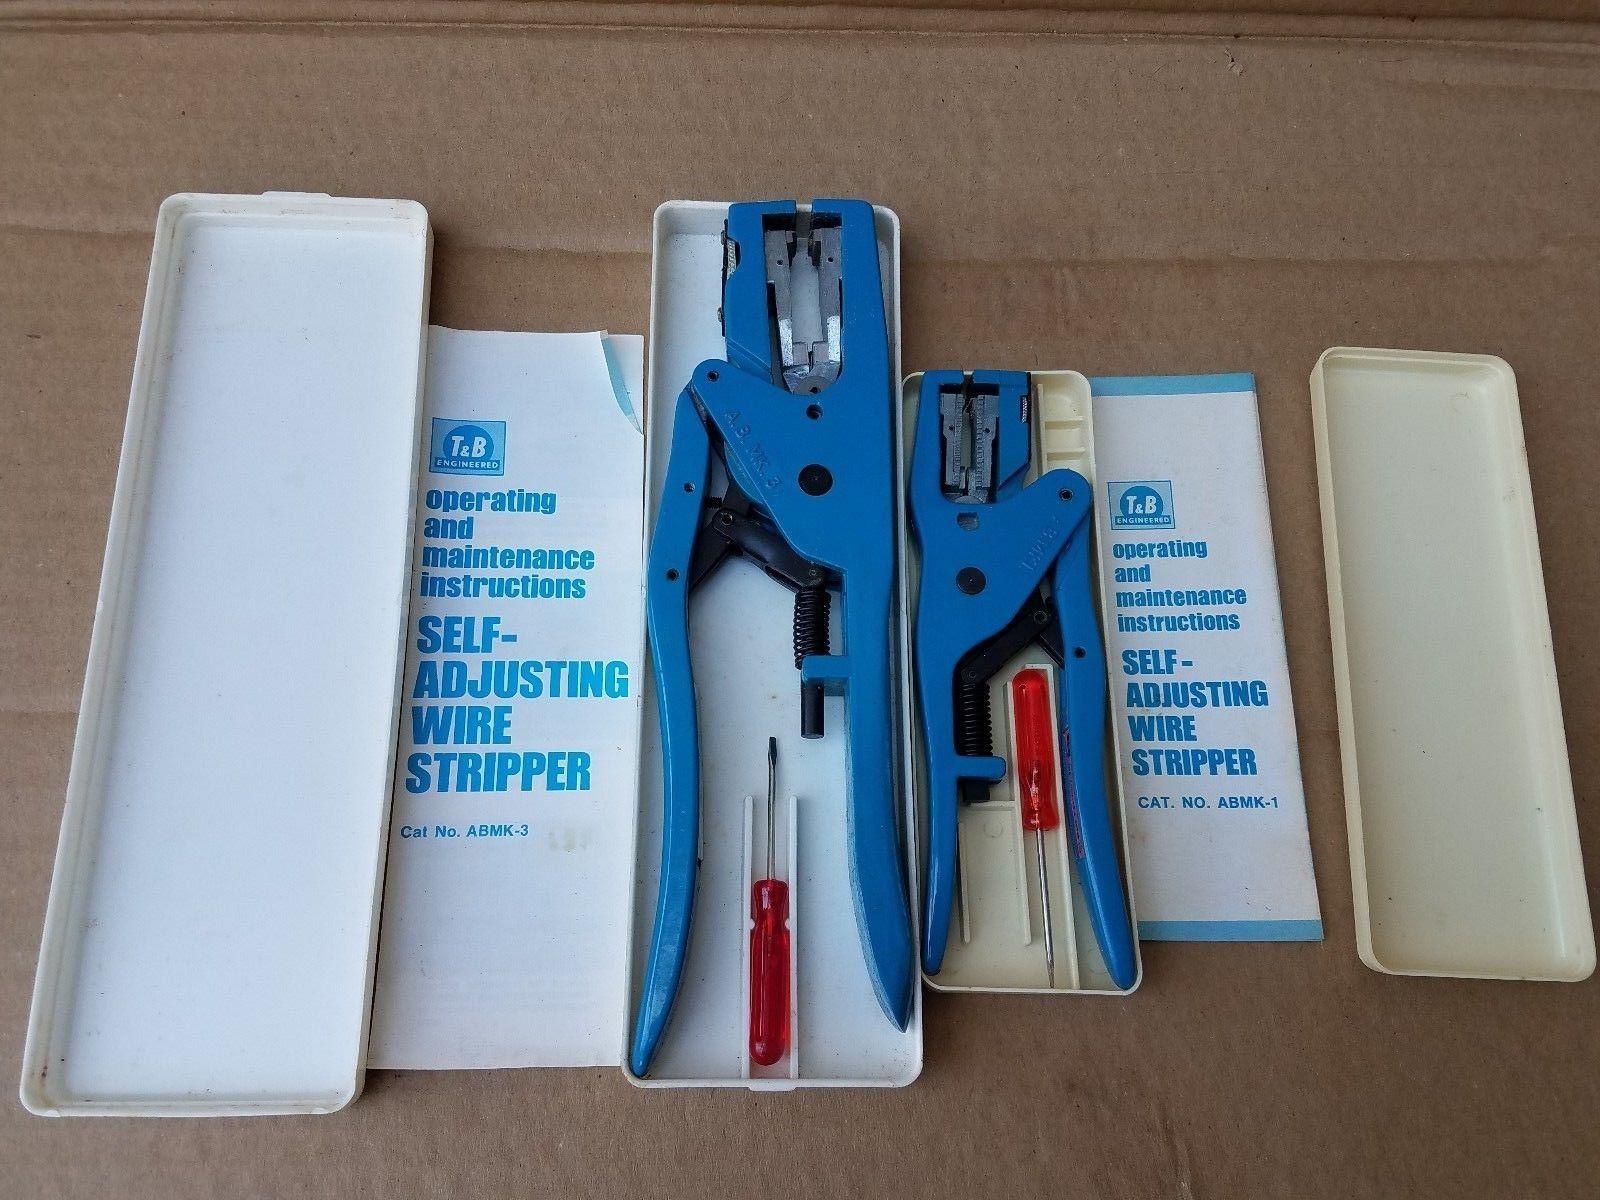 Thomas & Betts ABMK-1 & ABMK-3 Wire Stripper and 48 similar items